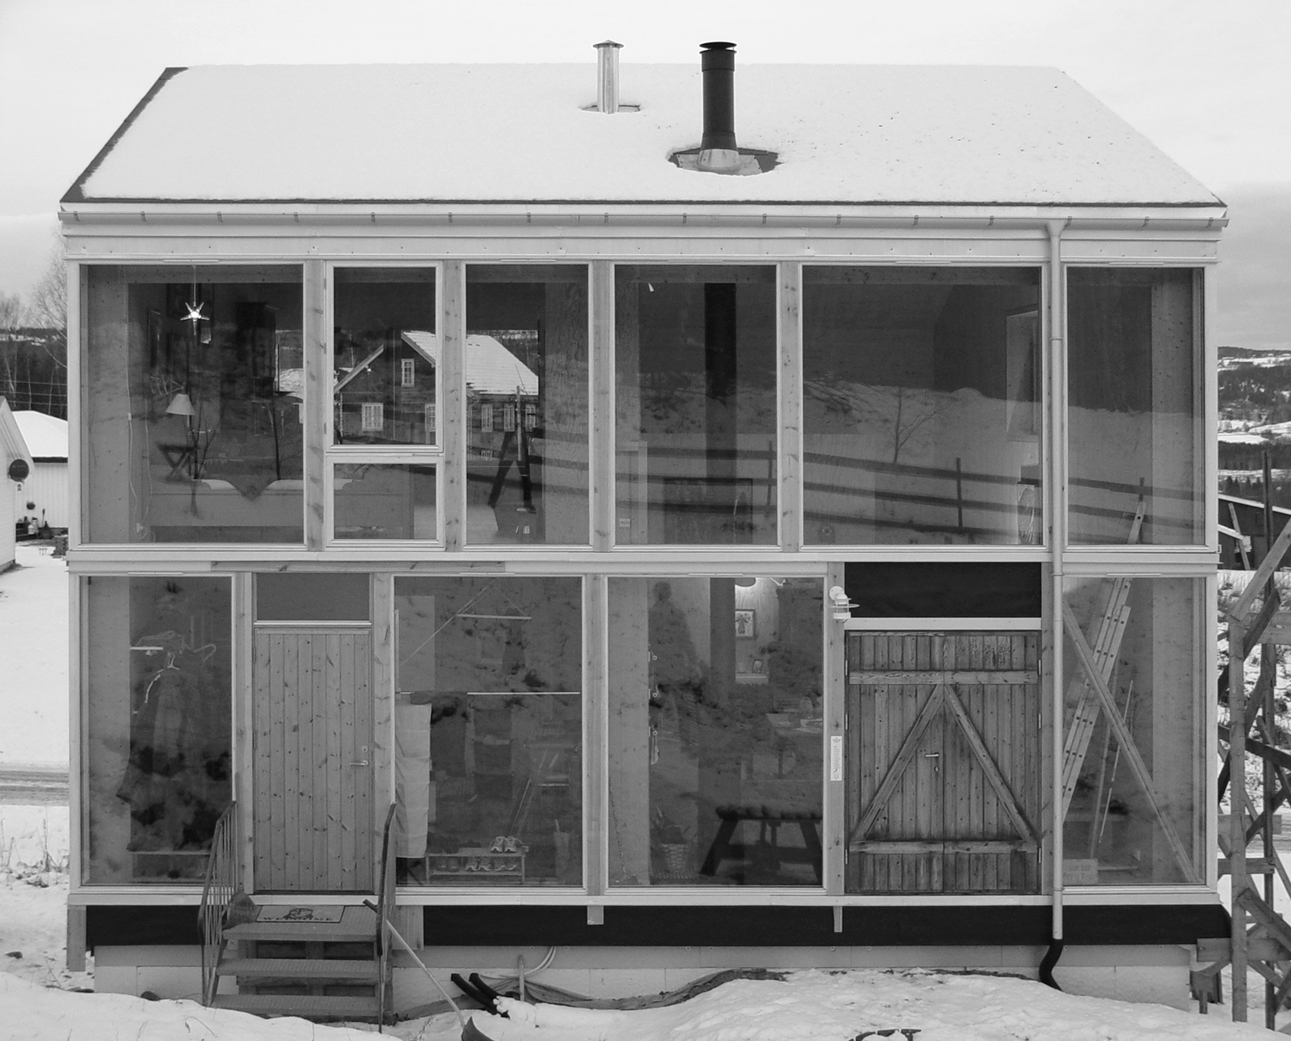 THE BIRISTRAND HOUSE